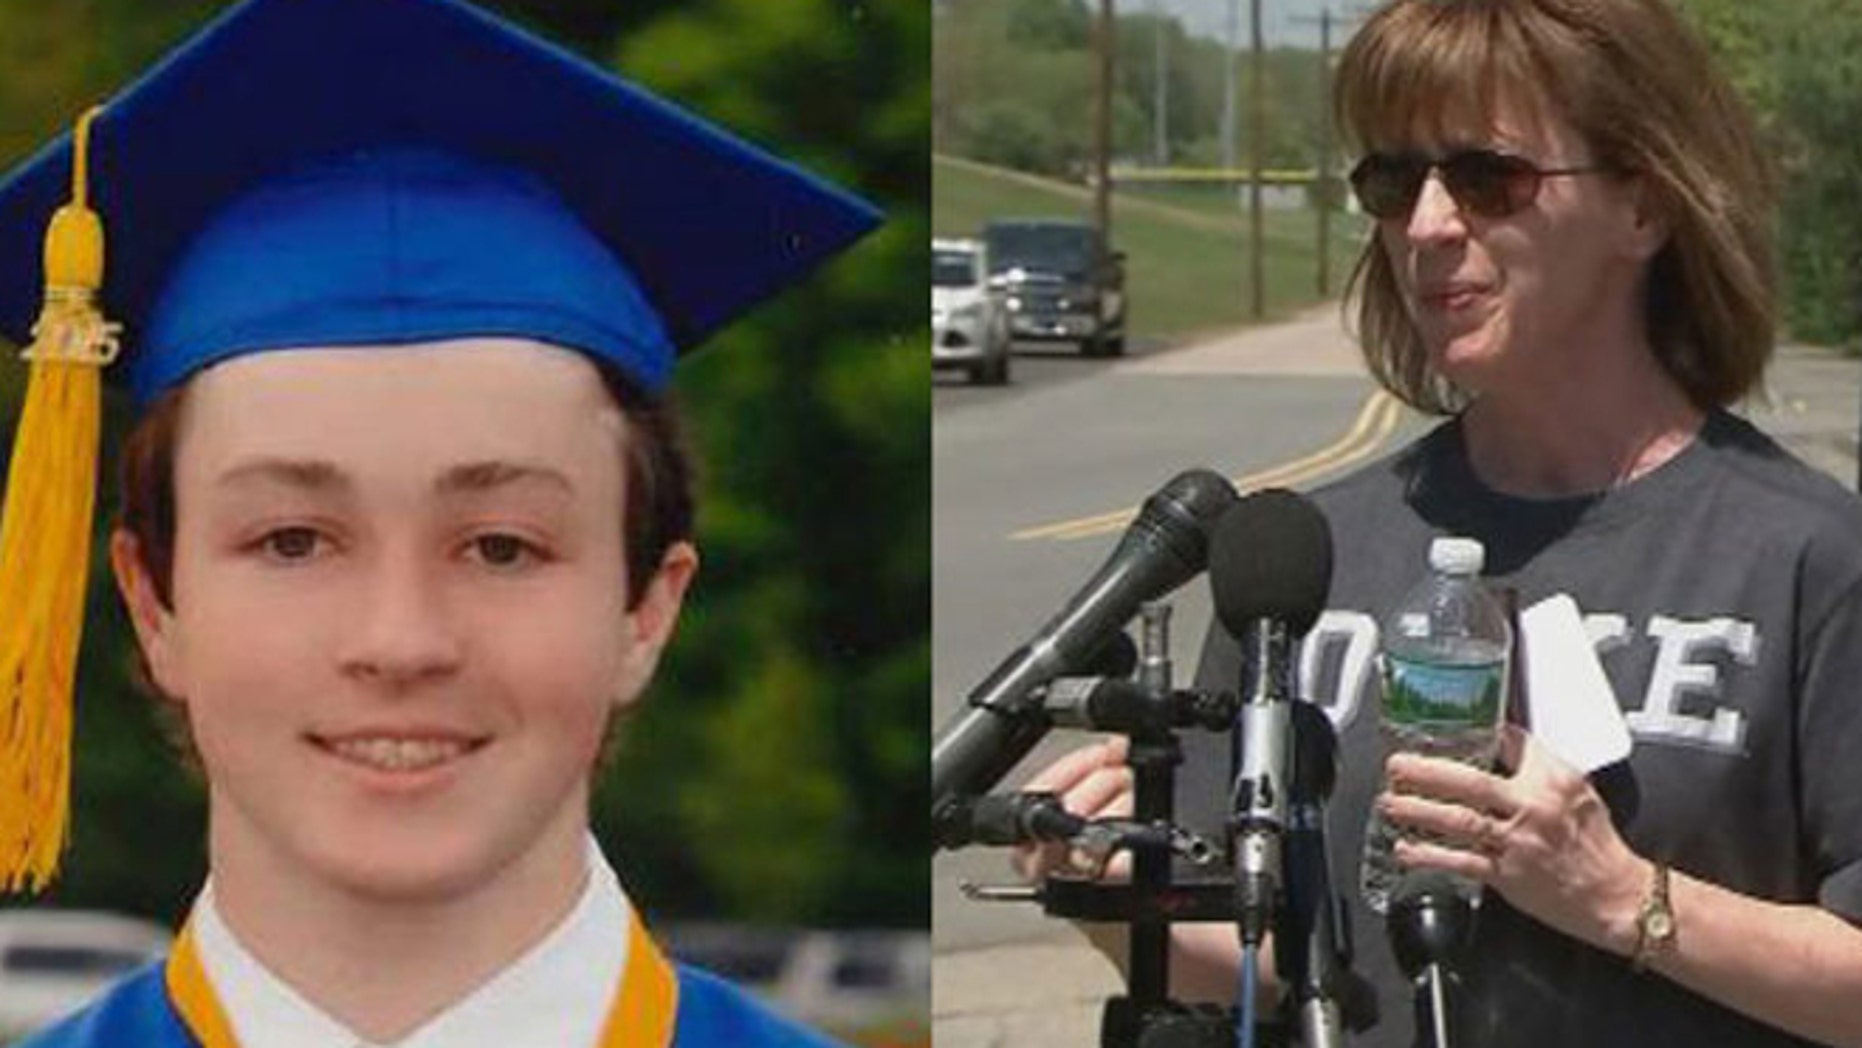 Nancy Doherty, mother of 20-year-old missing Duke University student Michael Doherty, desperately hopes her son will return home safe.